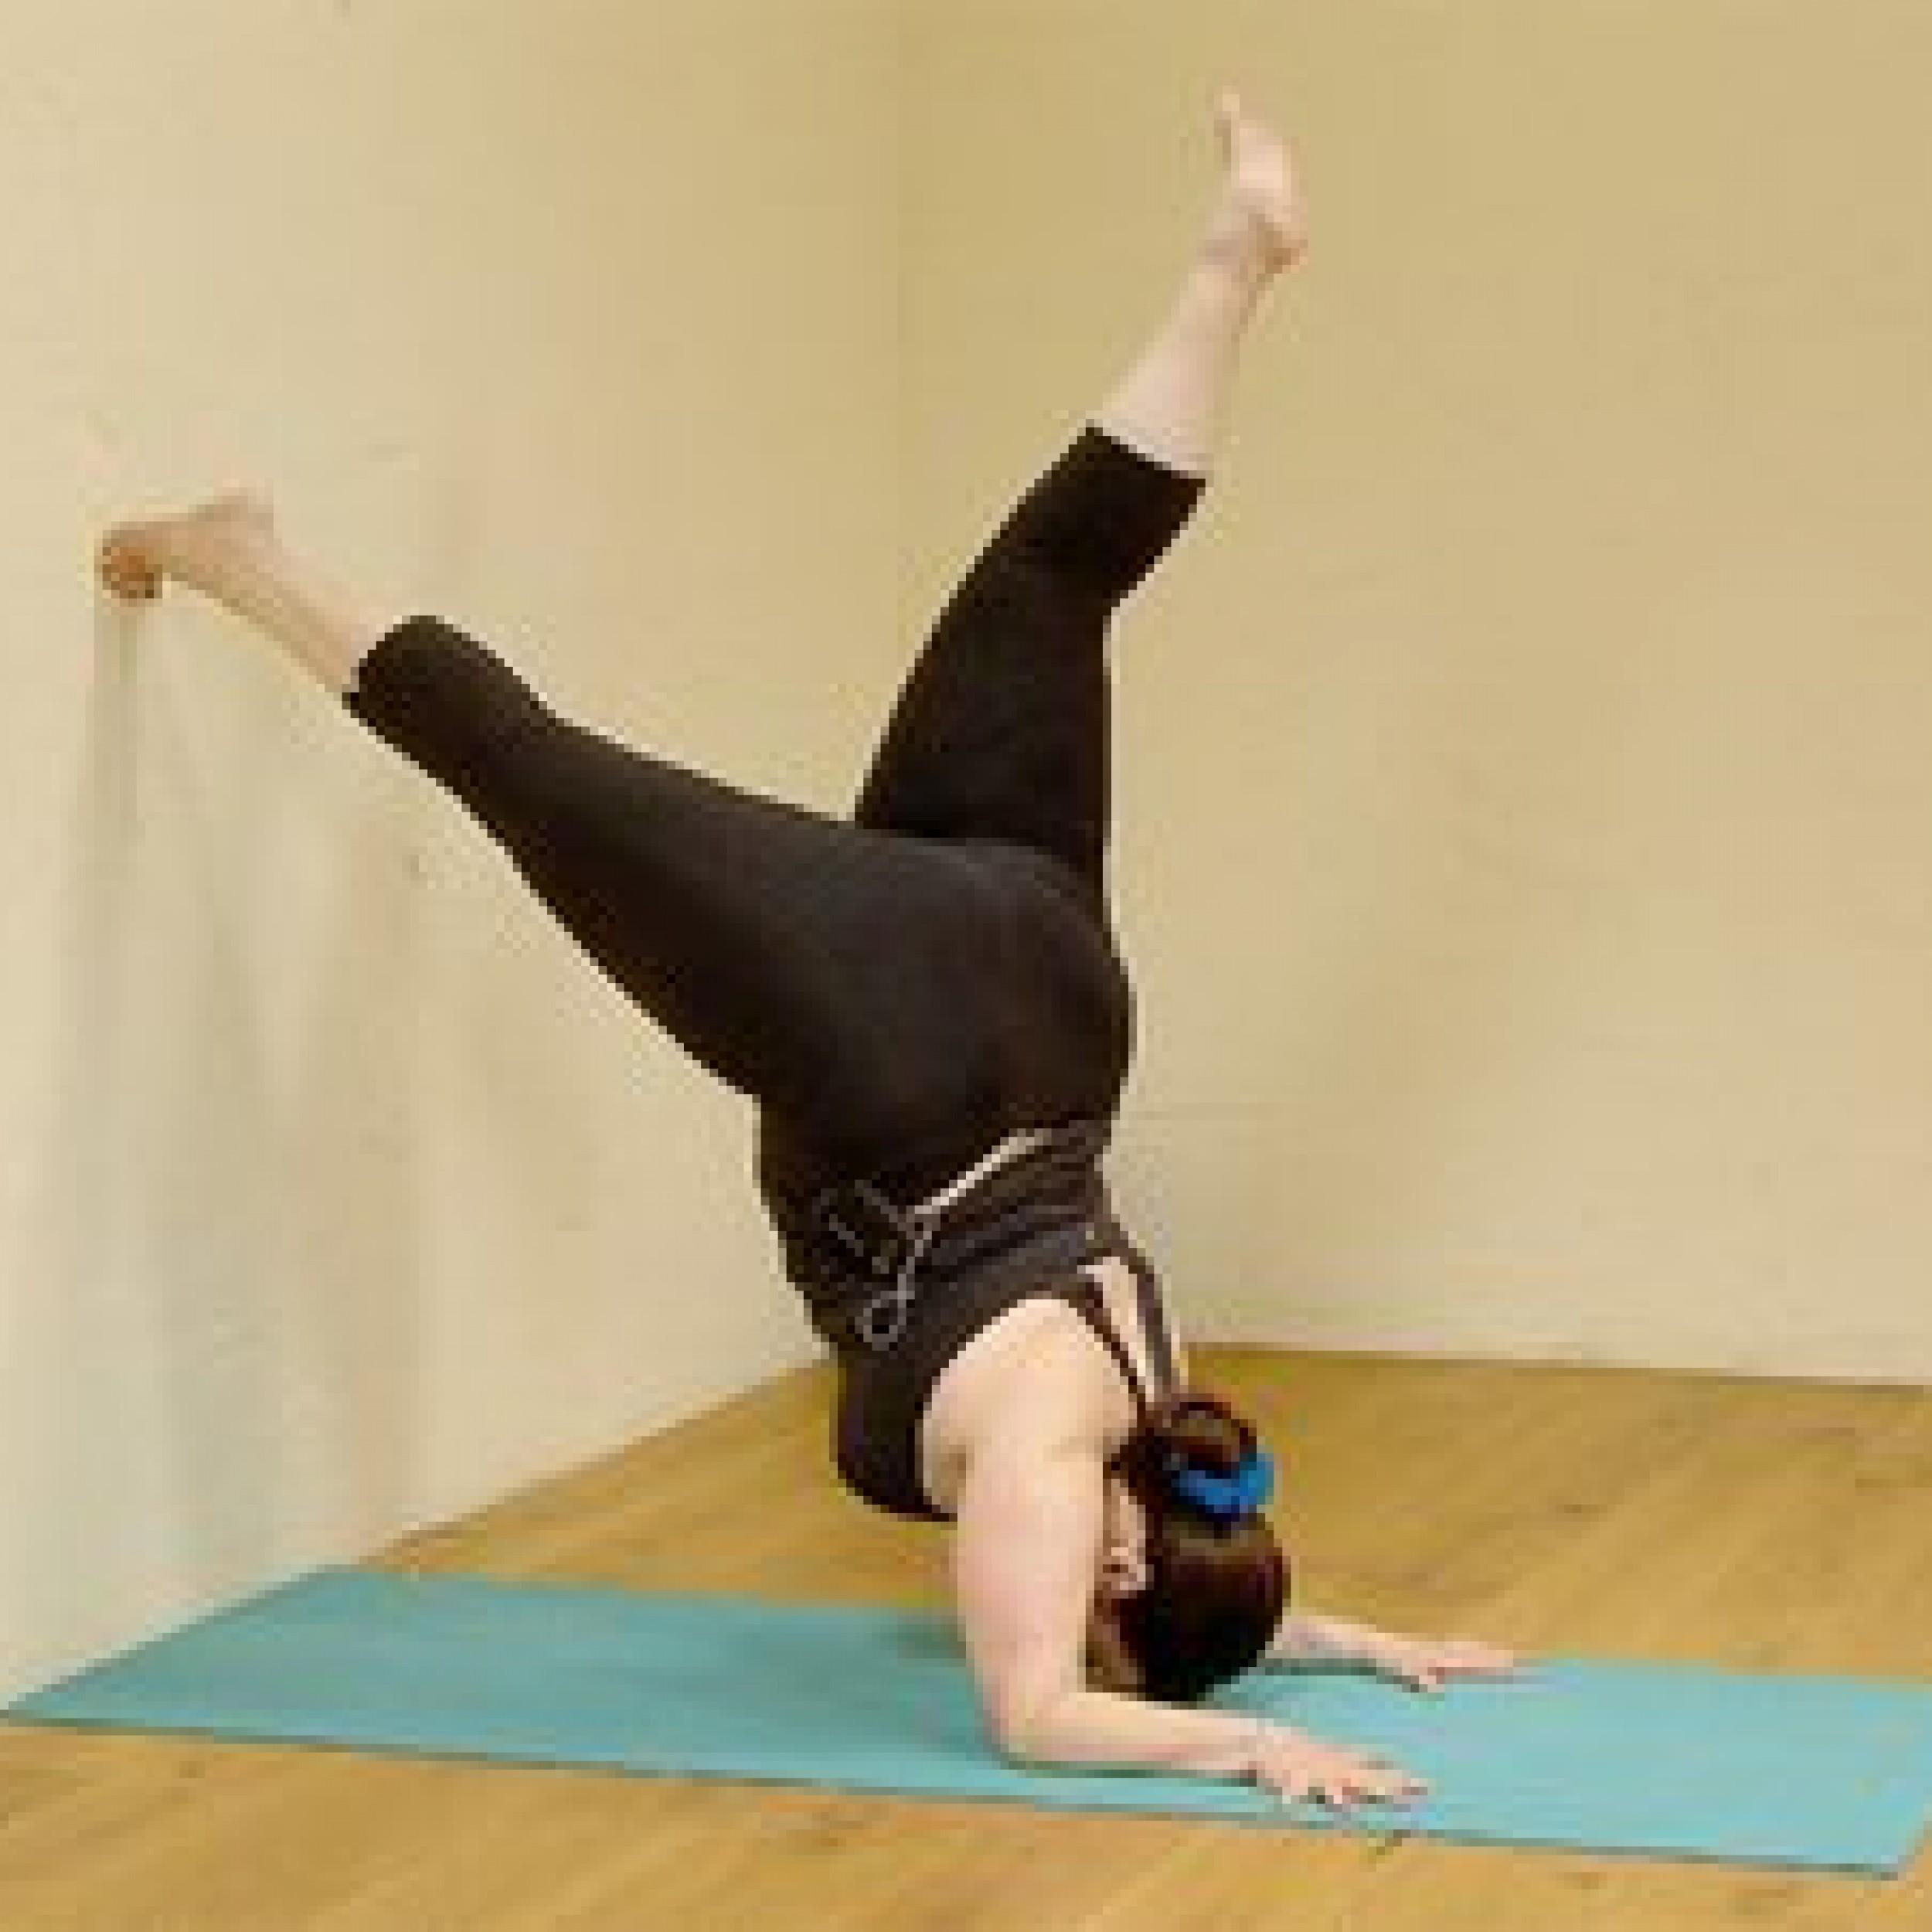 Forearm Balance Quick Tips